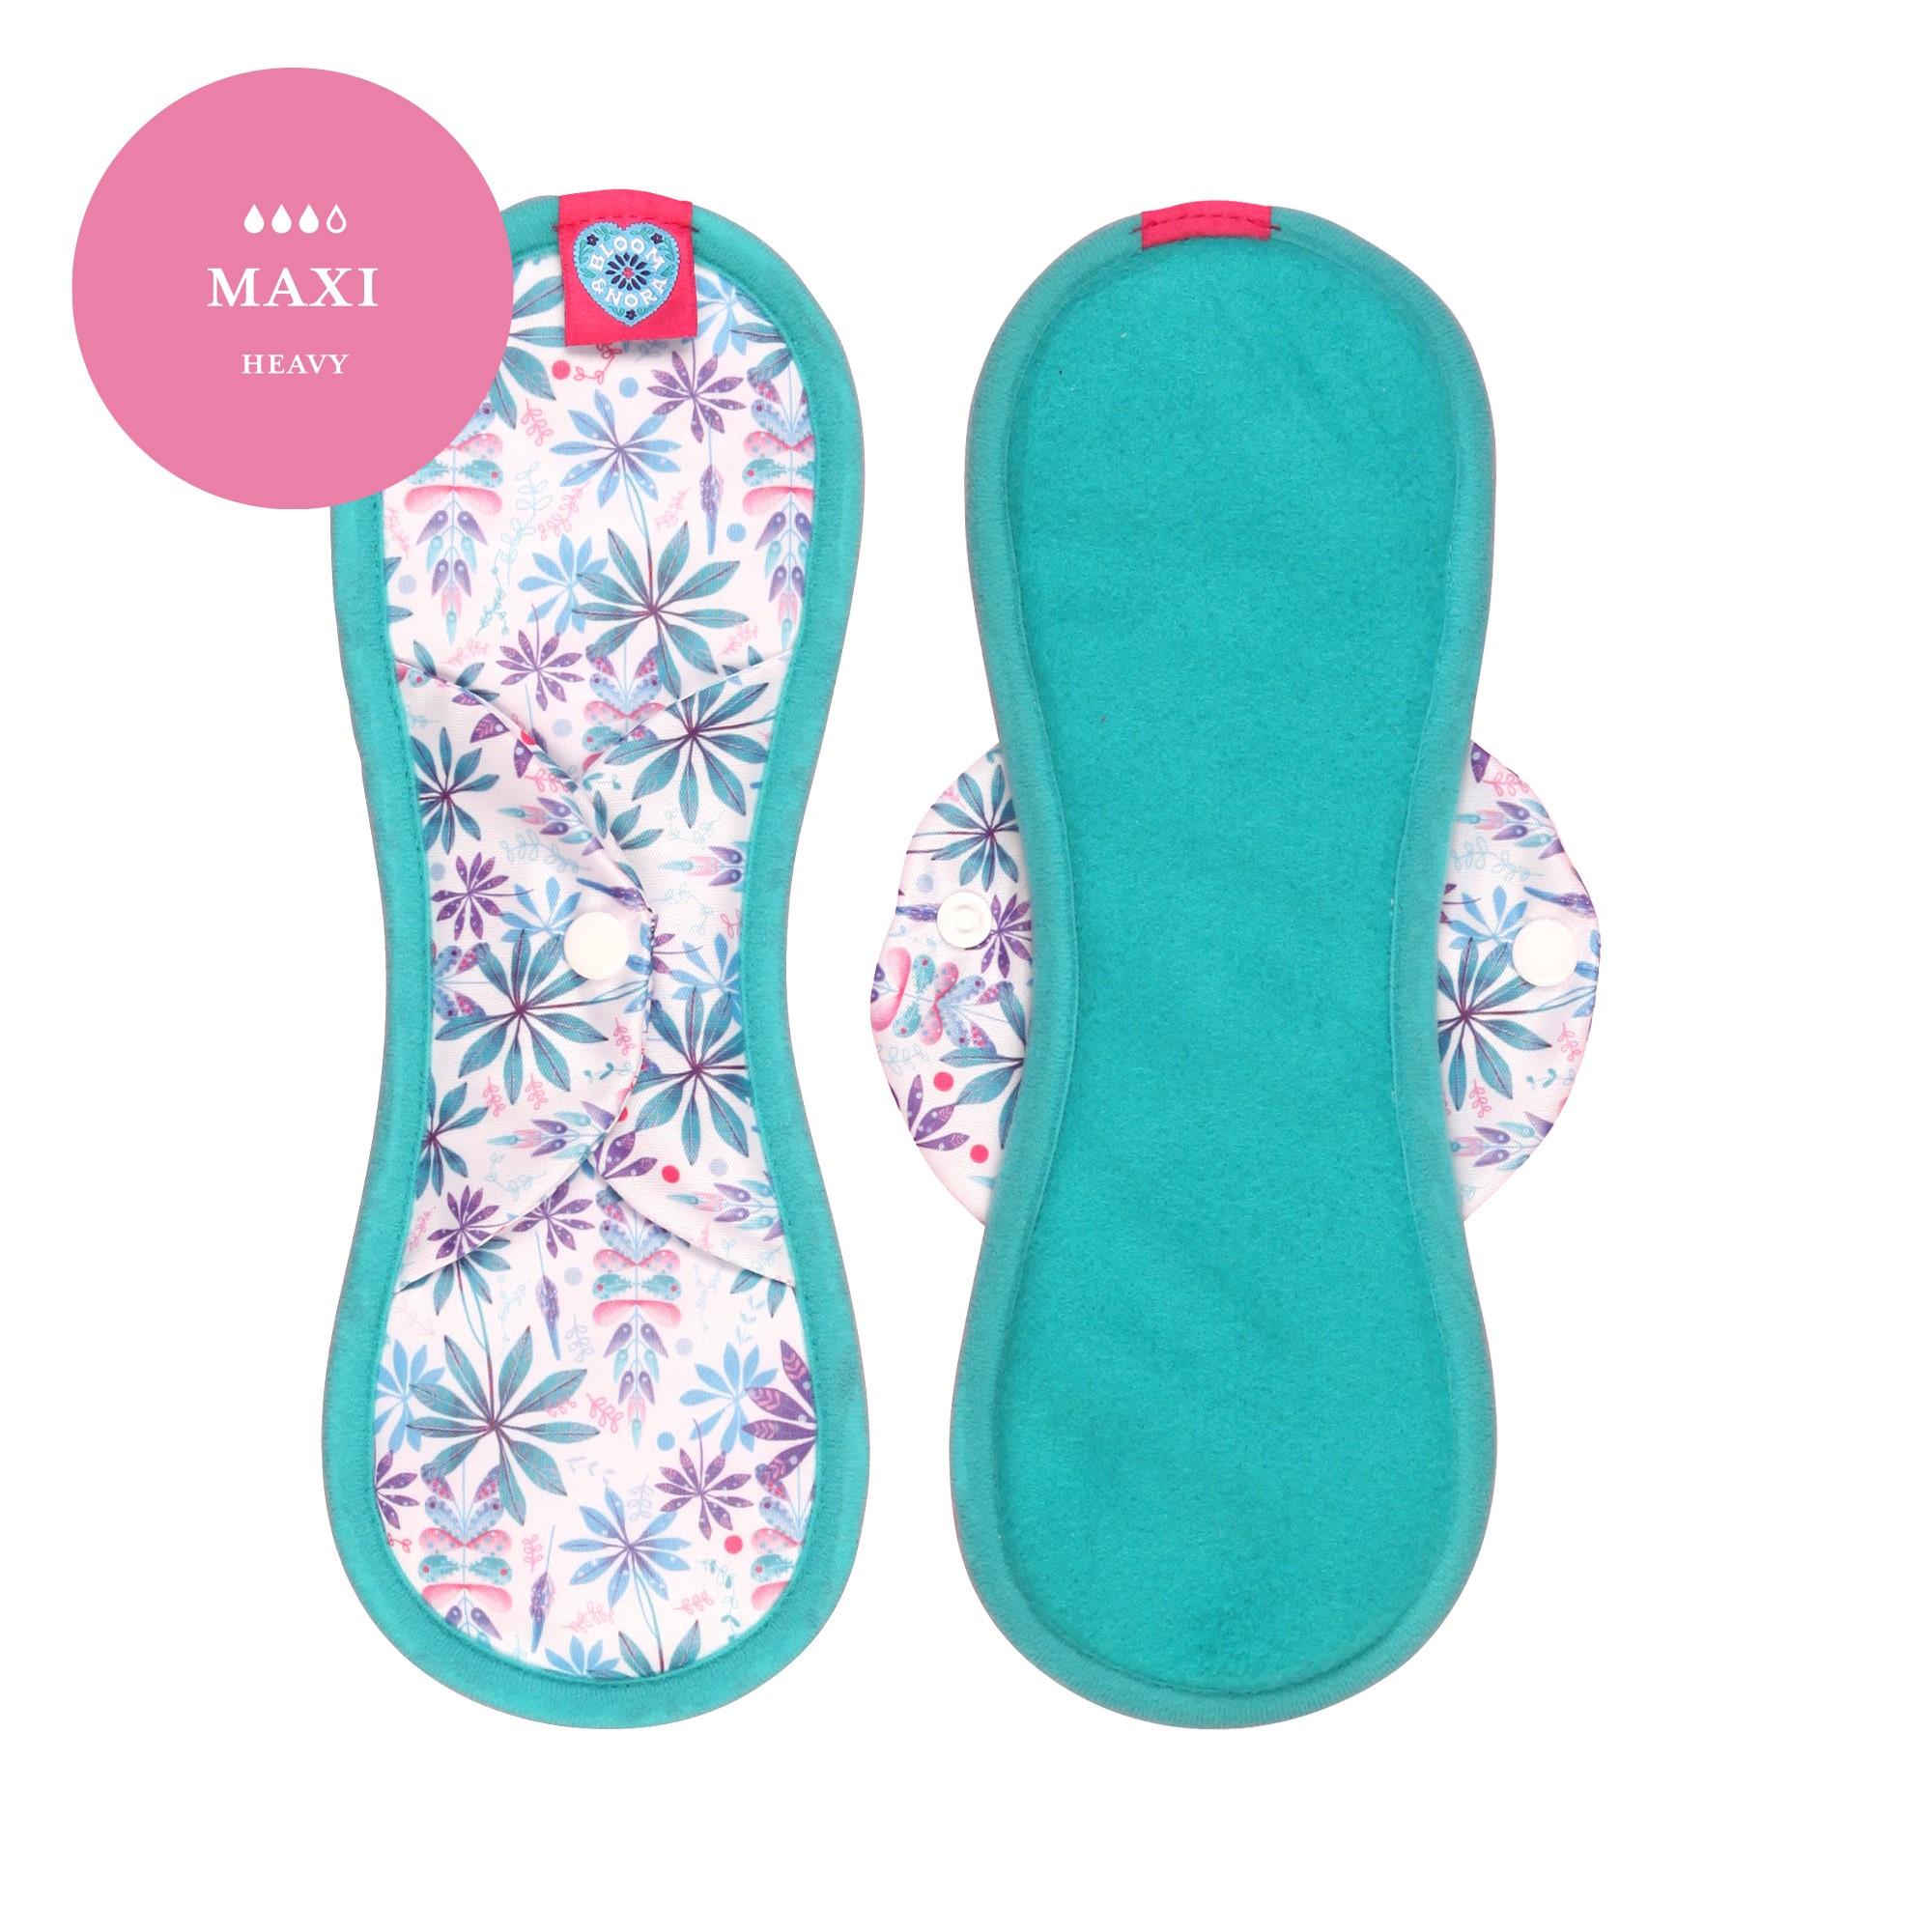 Maxi Sanitary Towel - Bloom and Nora